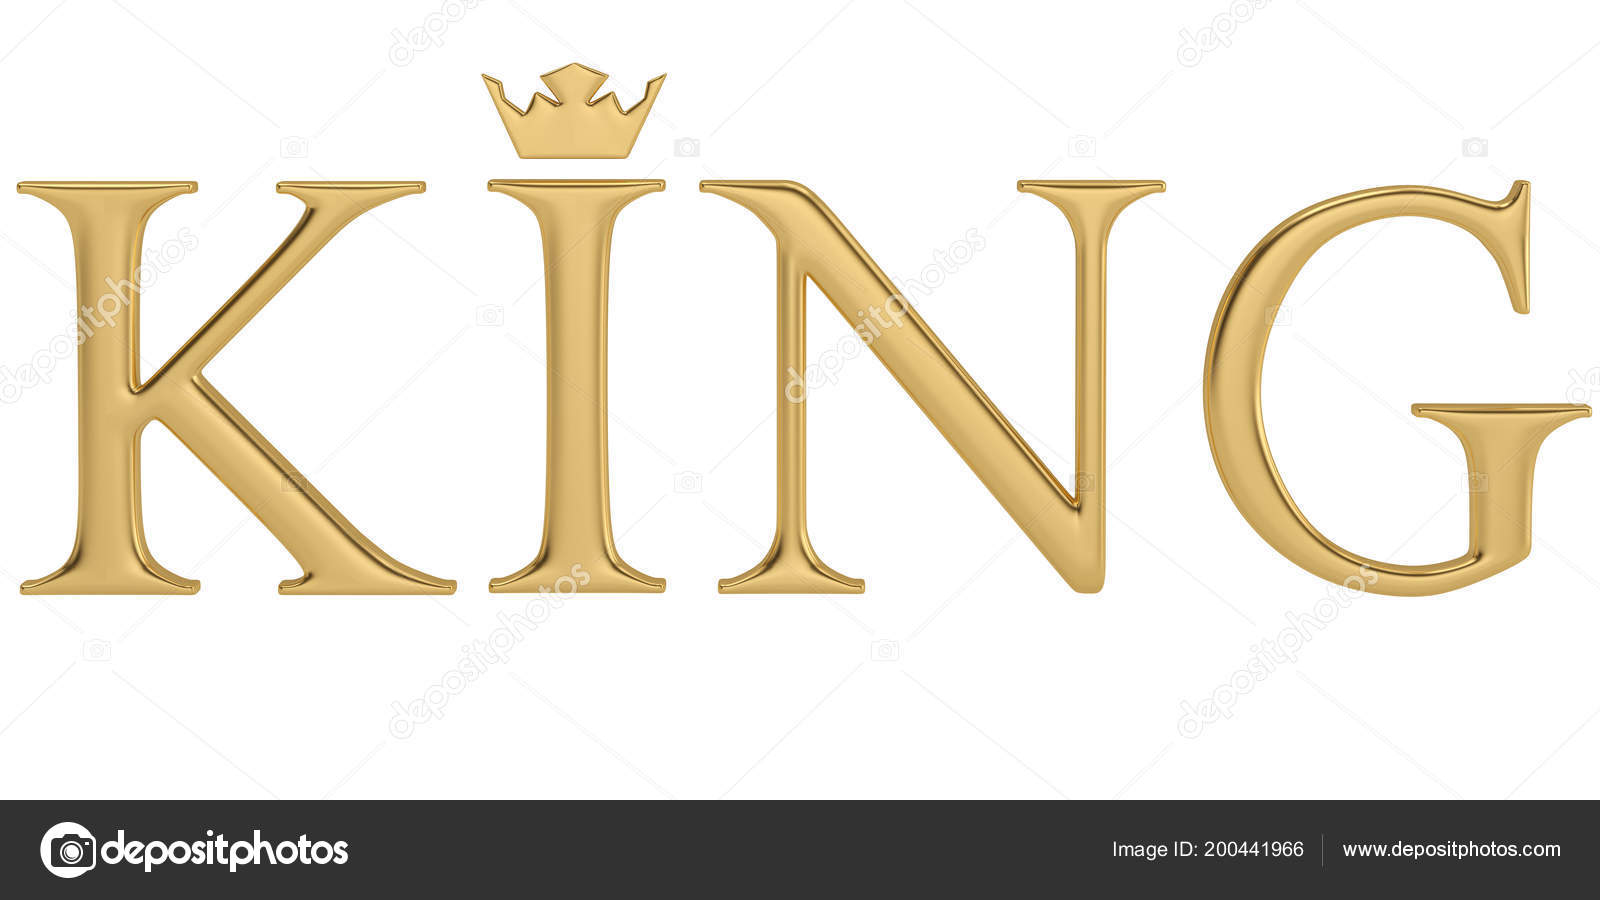 Gold Word King Isolated White Background Illustration — Stock Photo